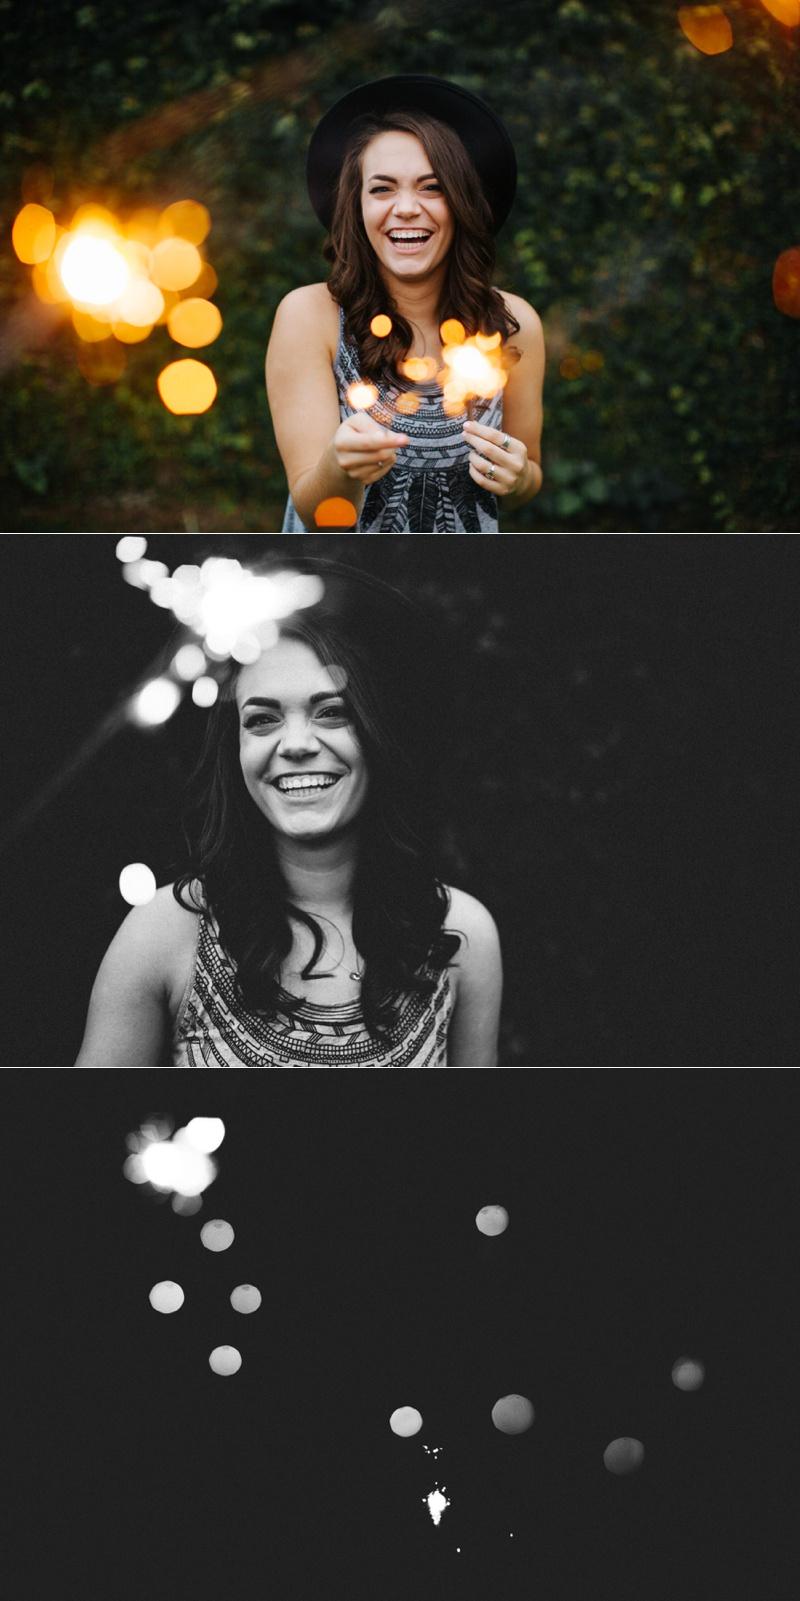 tampa sparklers senior portraits-3